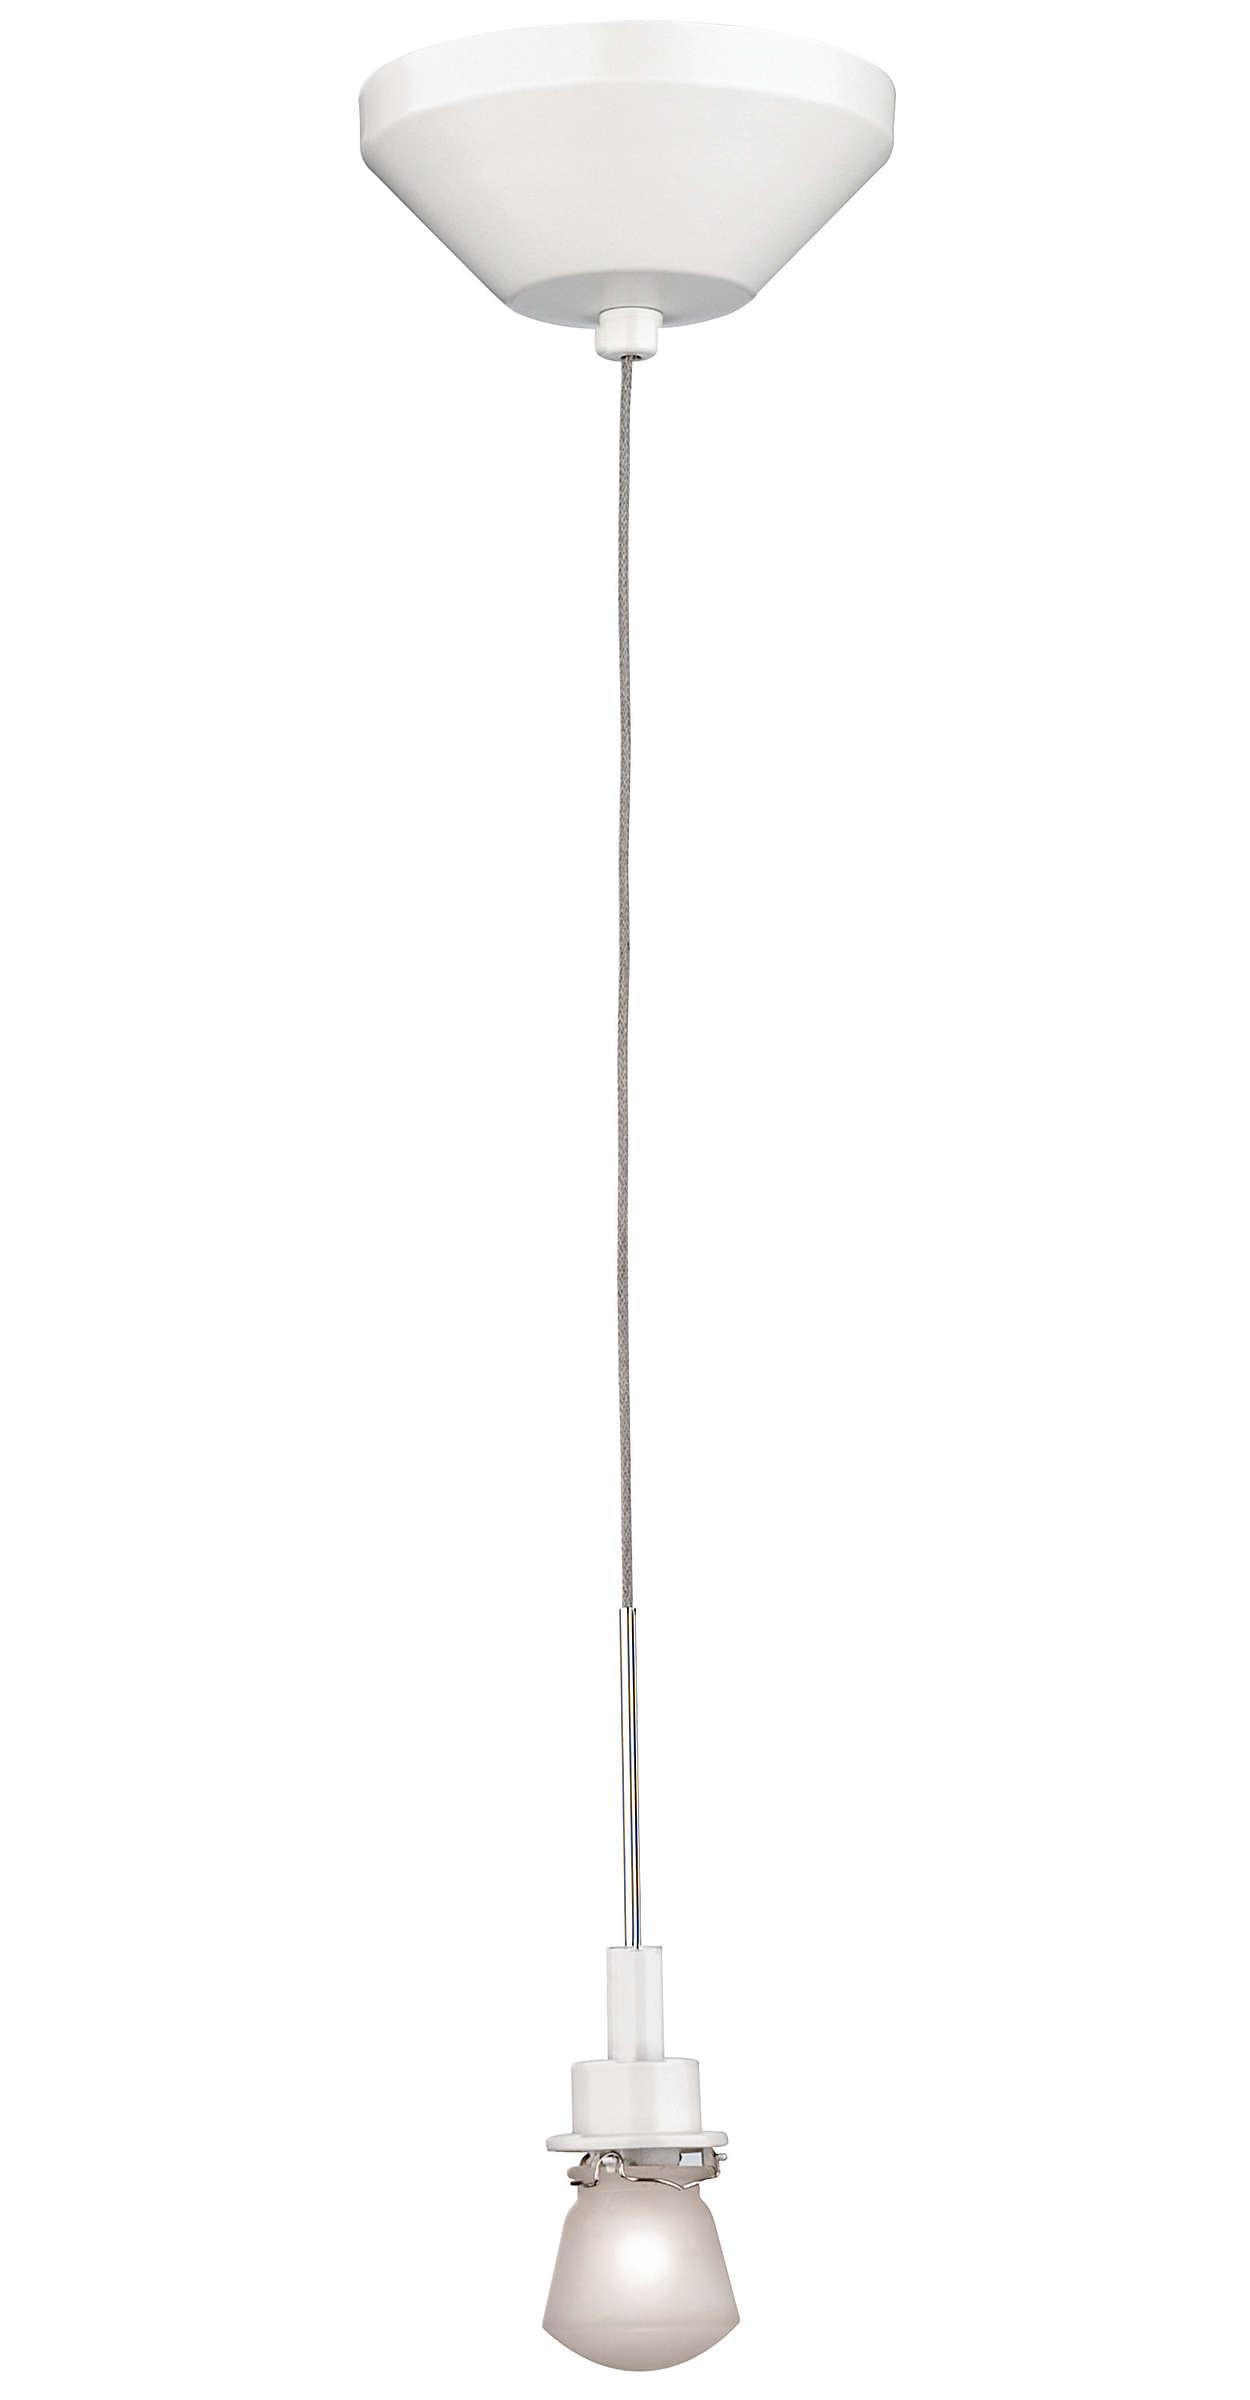 Suspension 1-light Pendant in Matte White finish